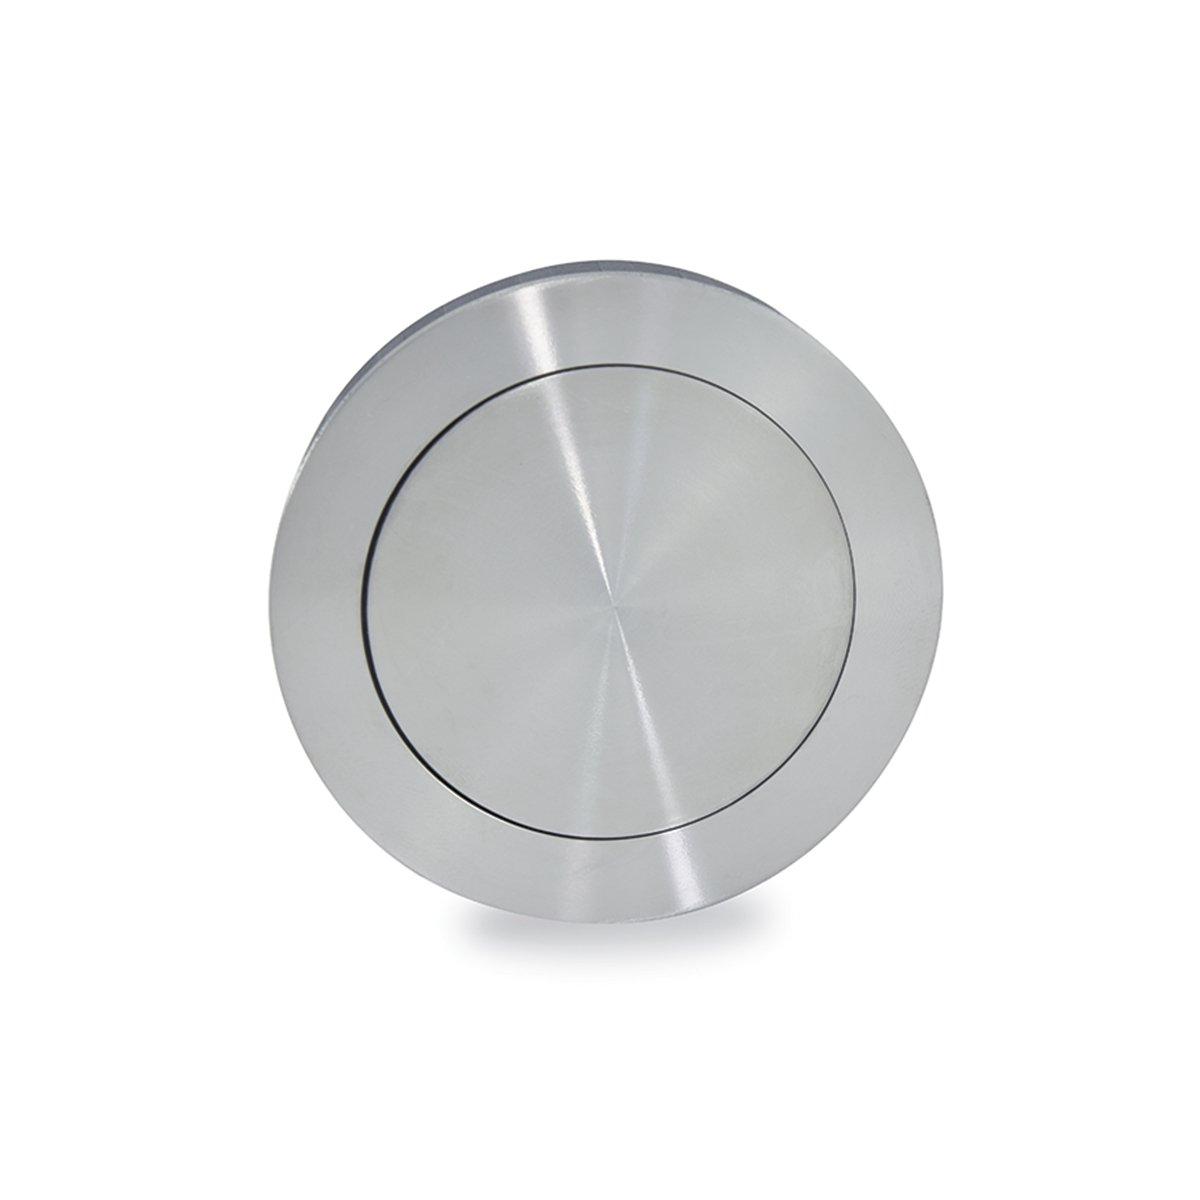 Jako WFH110X75PSS Round Flush Pull - Polish Stainless Steel, Diameter 2 61/64''